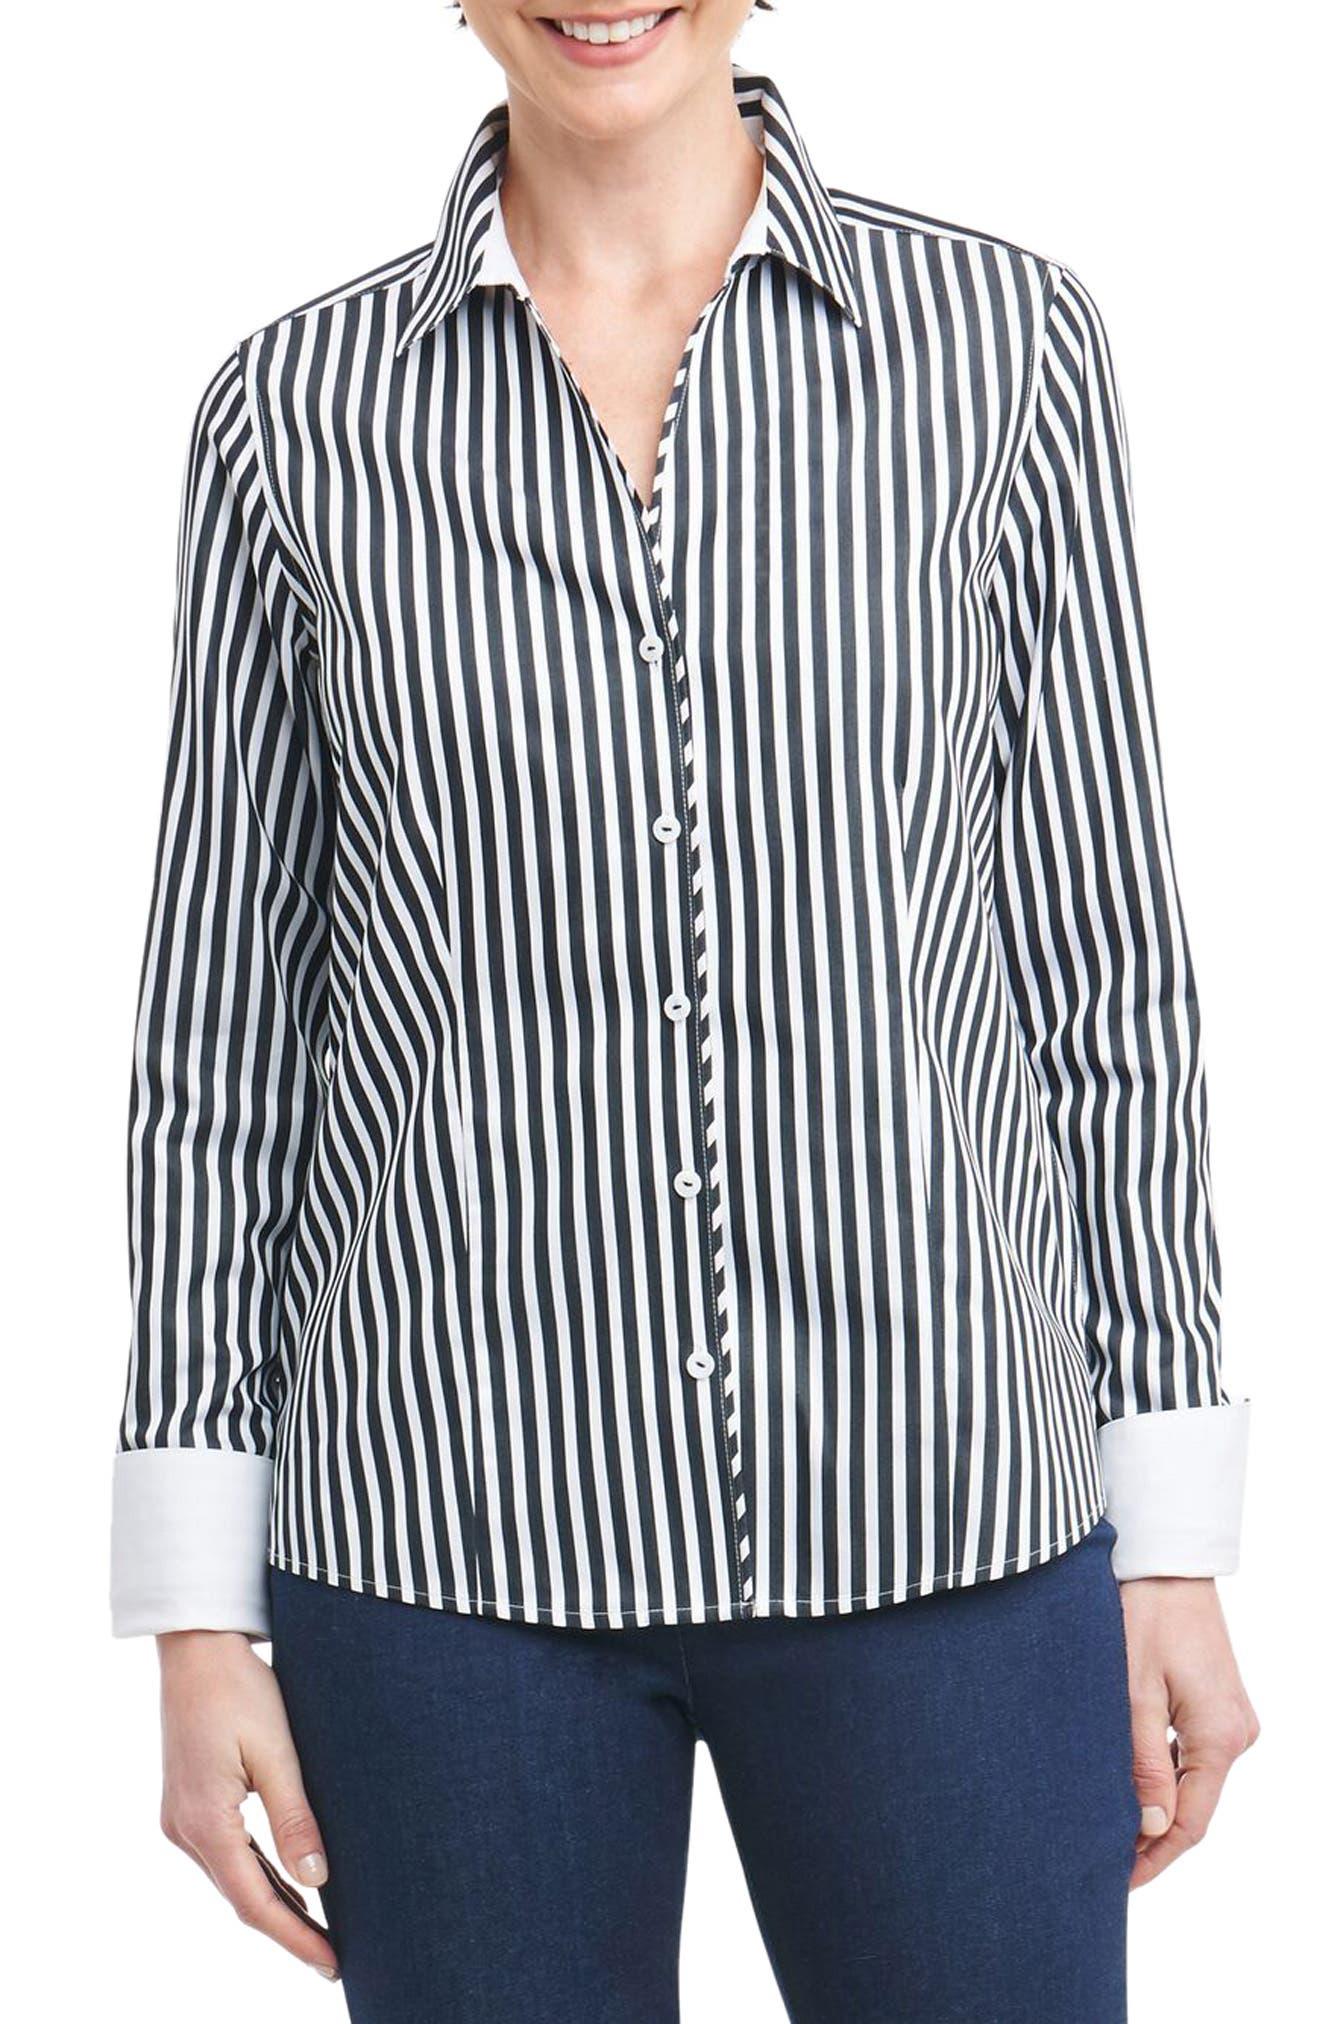 Lauren Sateen Stripe Shirt,                         Main,                         color,